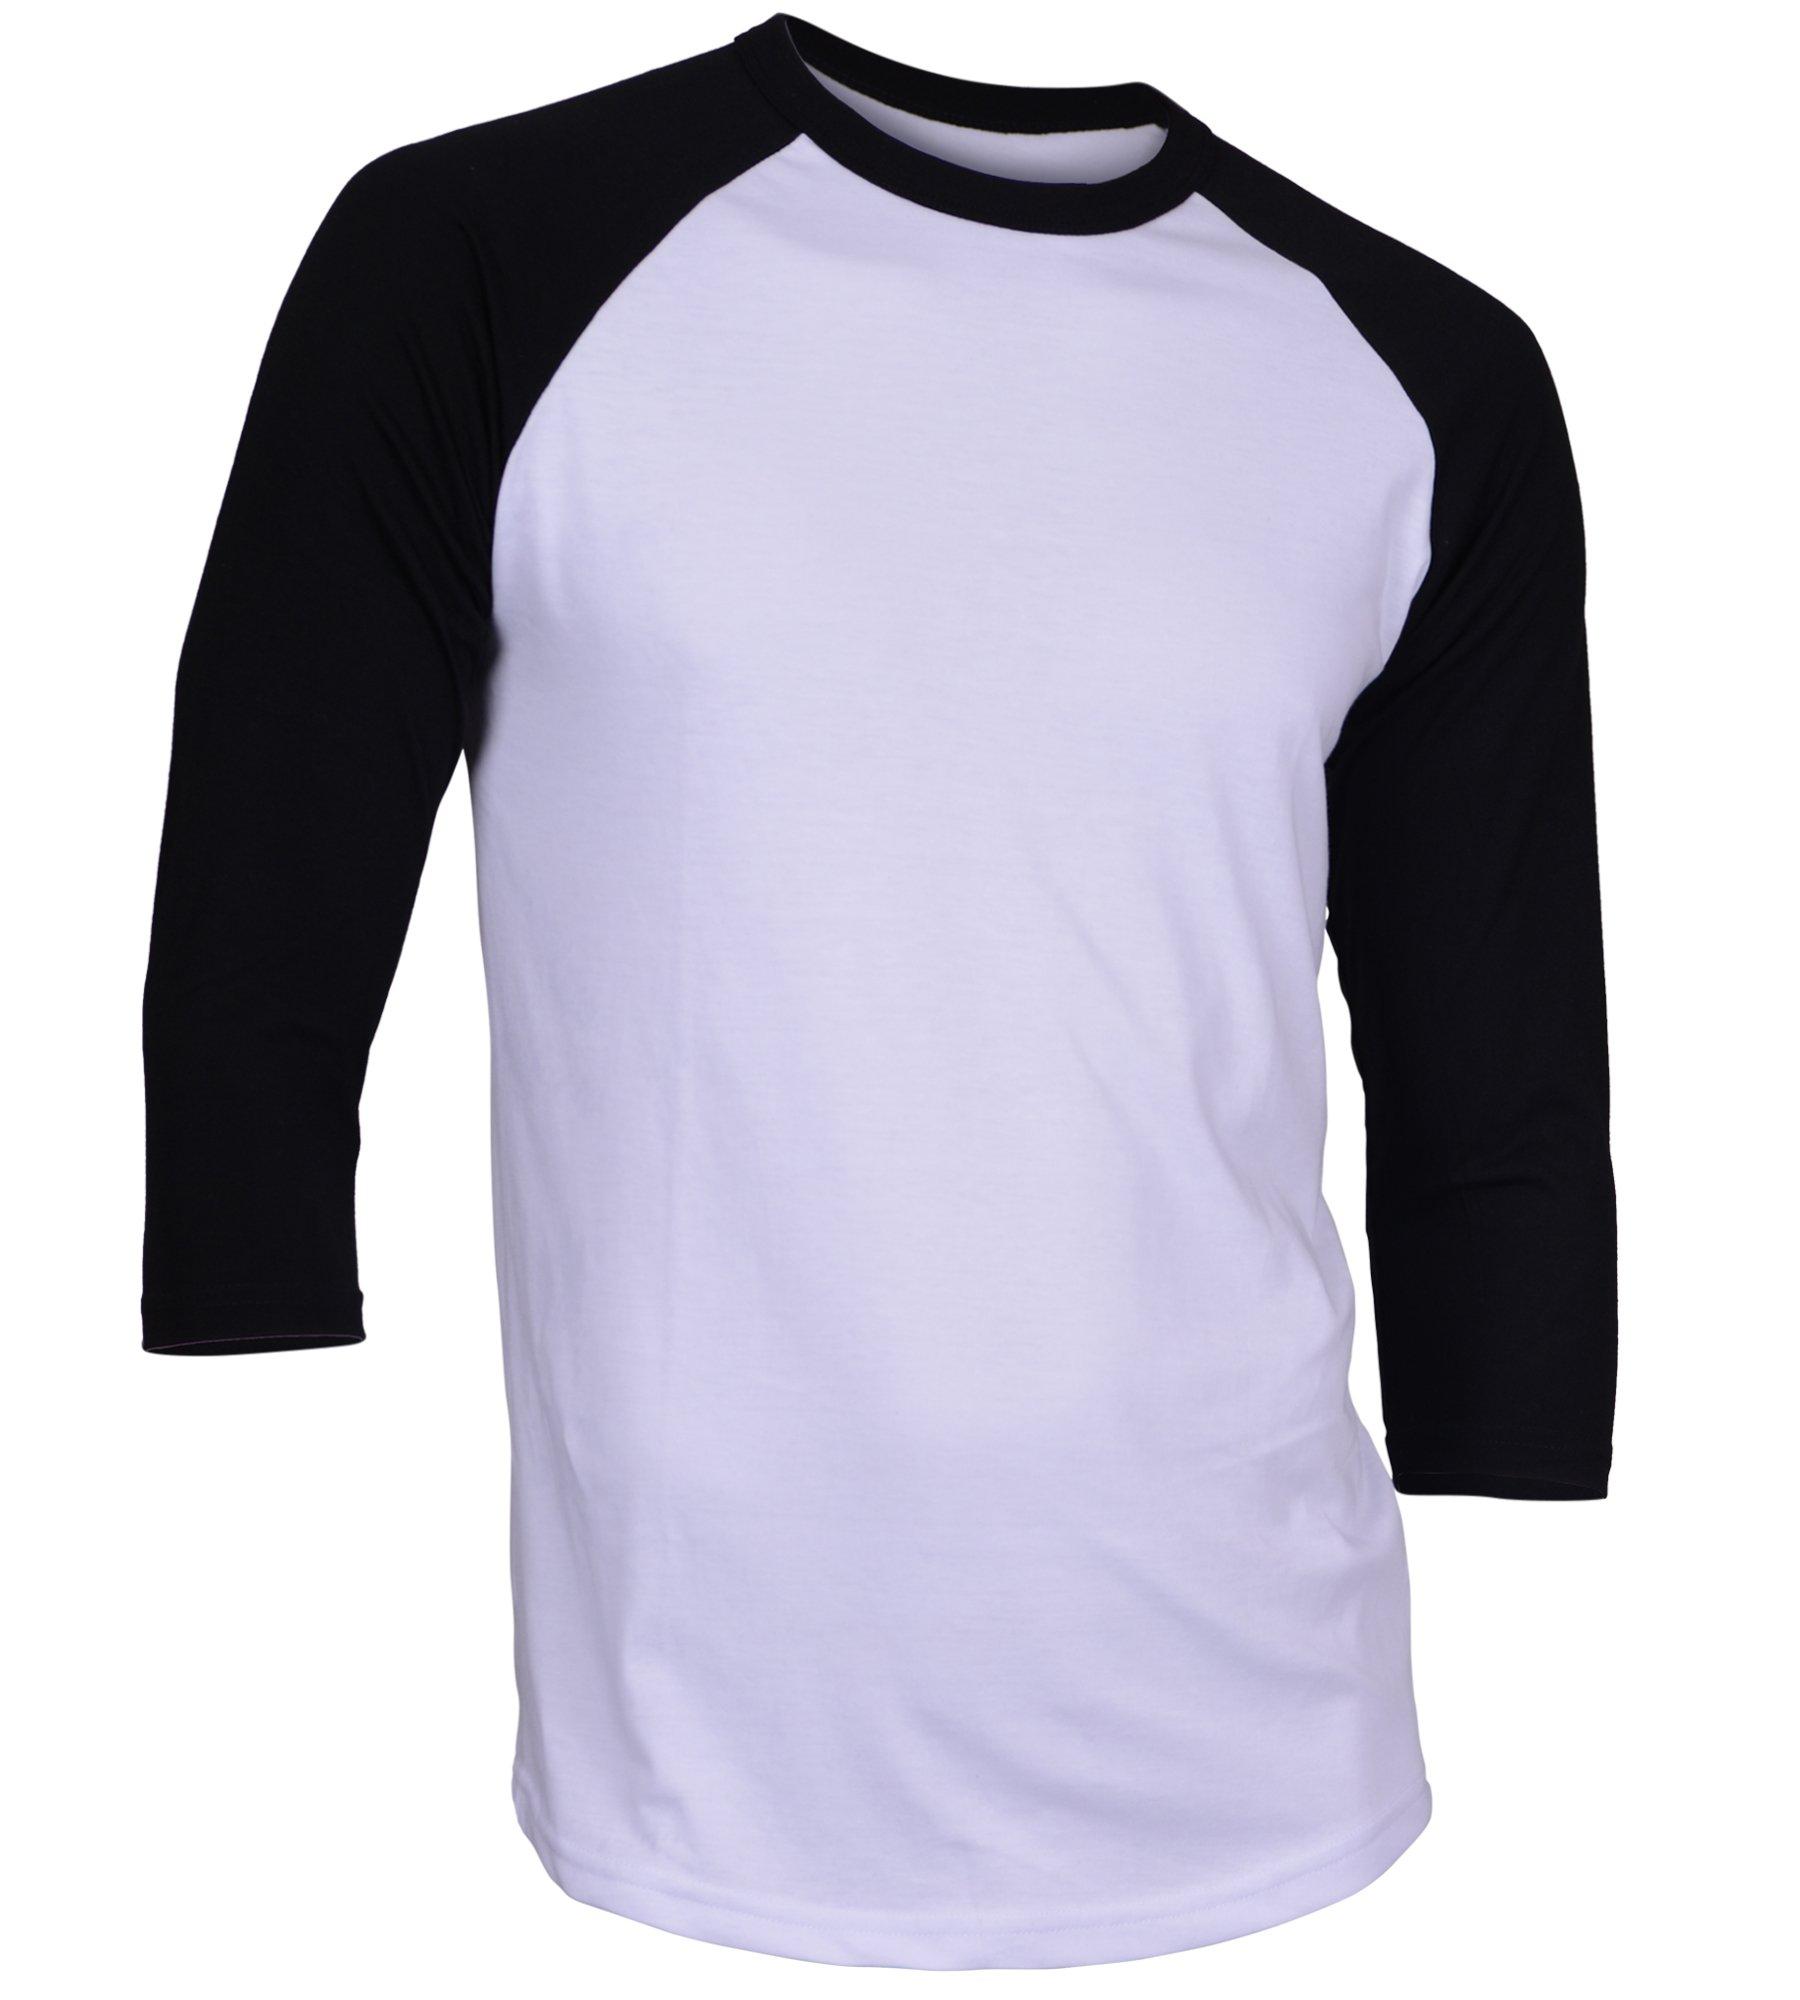 Dream USA Men's Casual 3/4 Sleeve Baseball Tshirt Raglan Jersey Shirt White/Black Medium